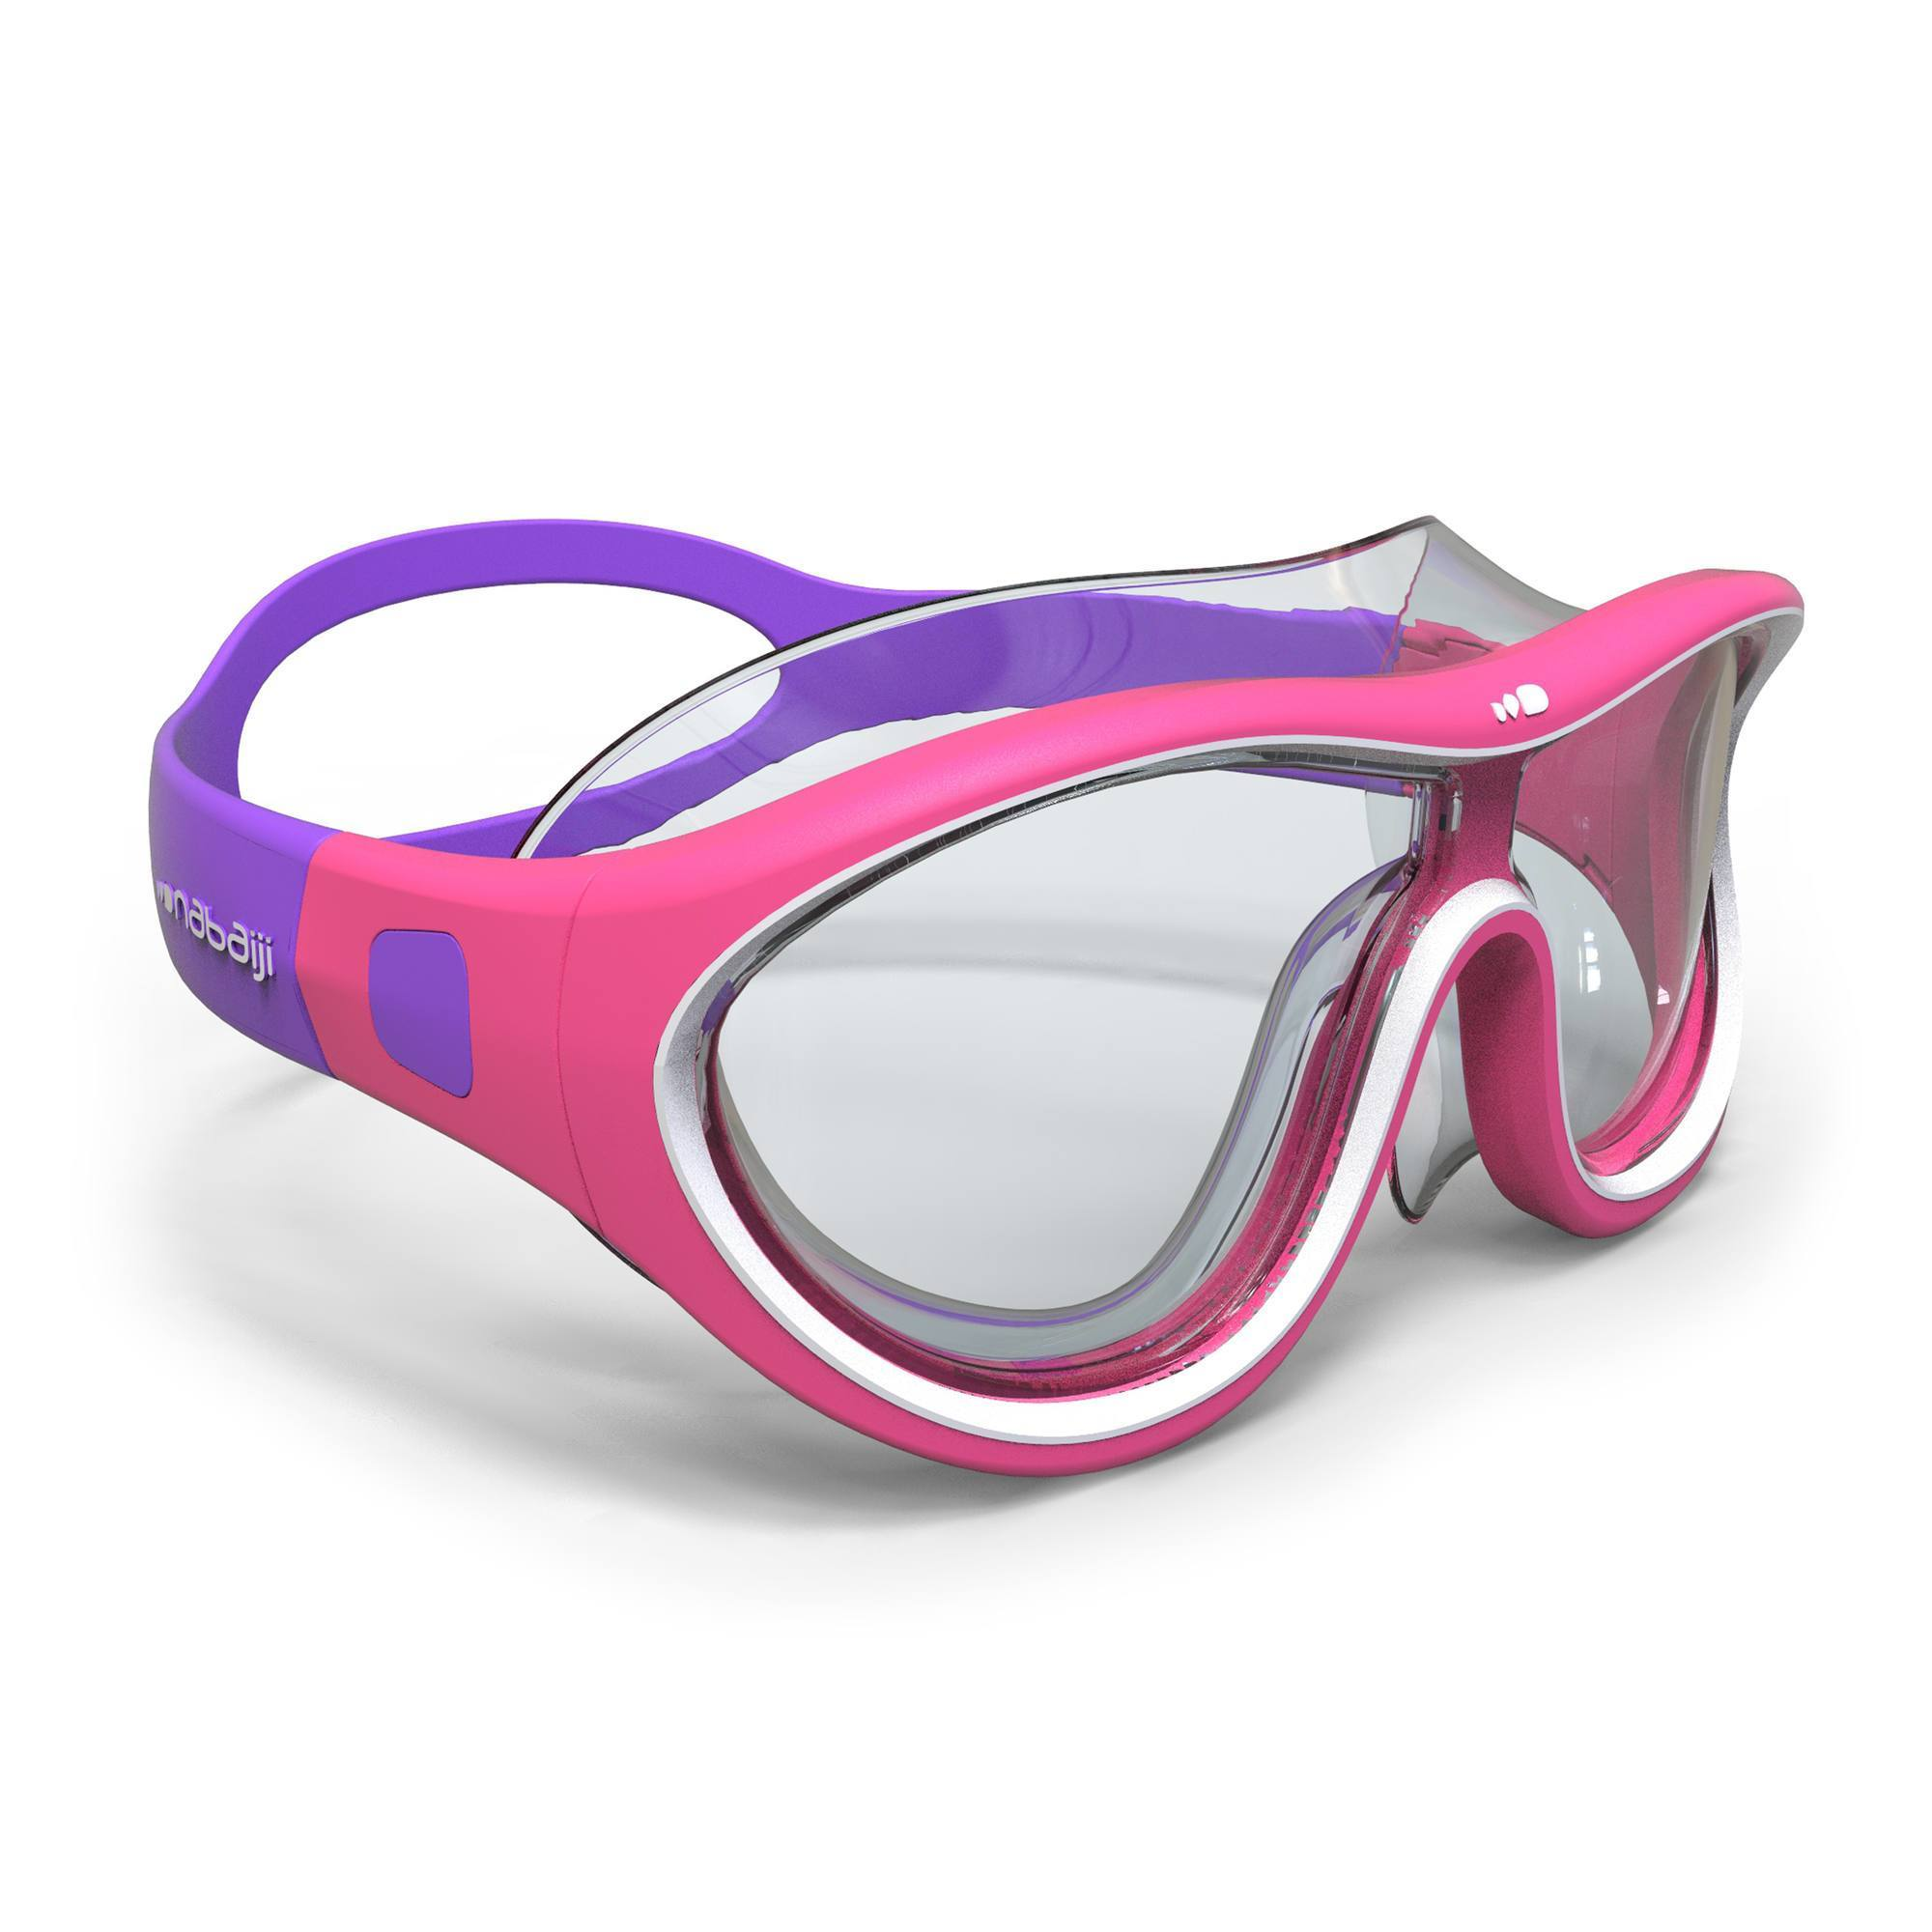 Masque de natation 100 SWIMDOW Taille S Rose Blanc